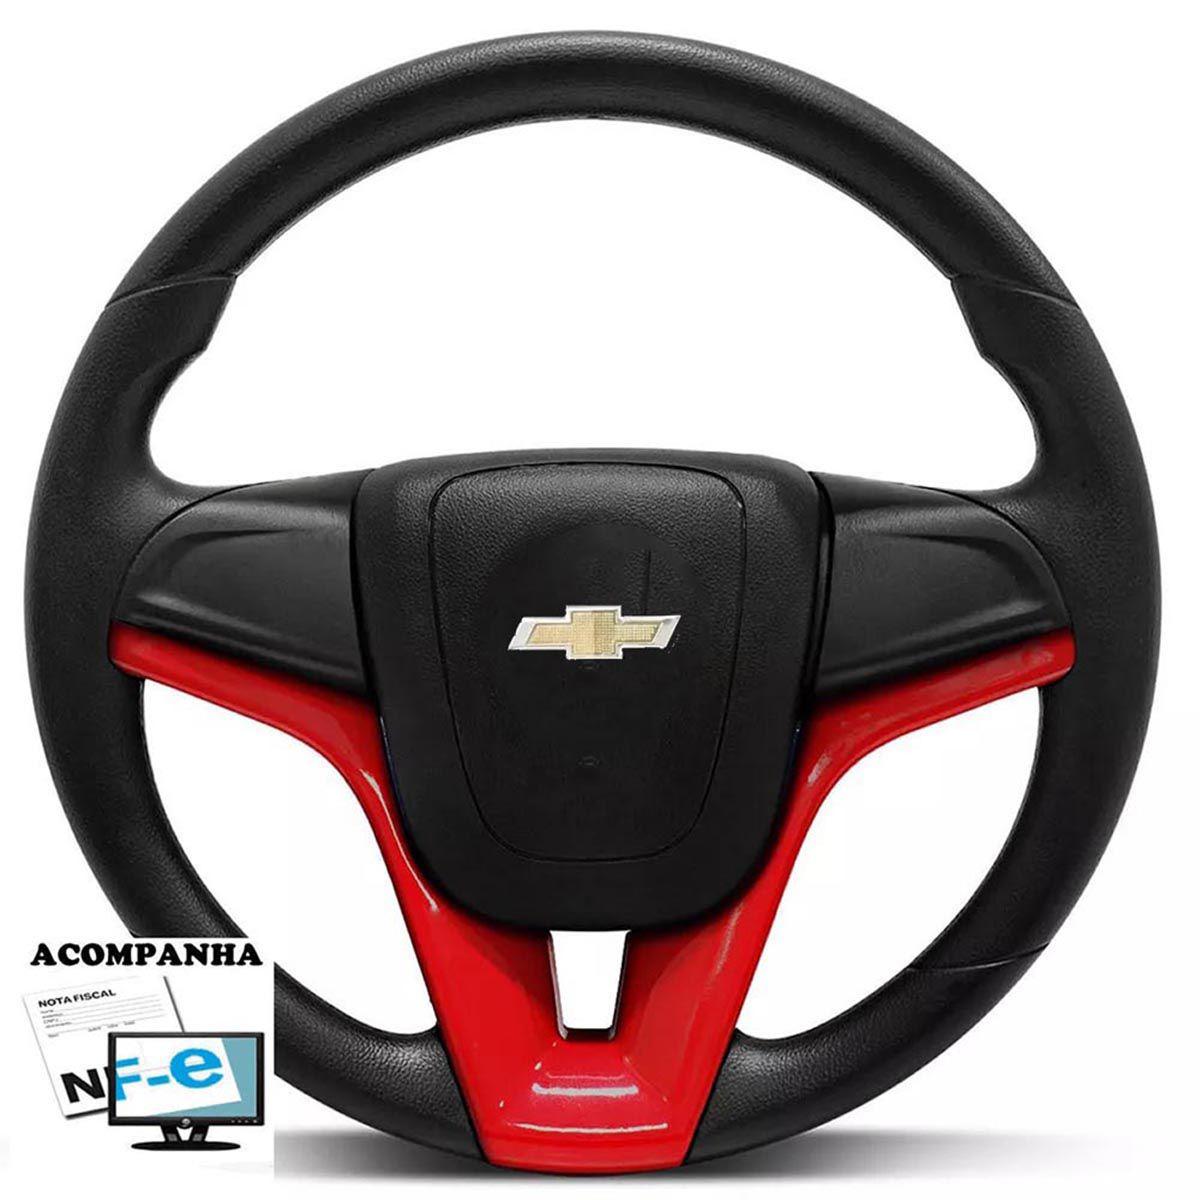 Volante Esportivo Cruze Corsa Celta Astra Monza Chevette S10 Blazer Silverado Meriva Zafira Omega Kadett Opala Chevrolet + Cubo Gm